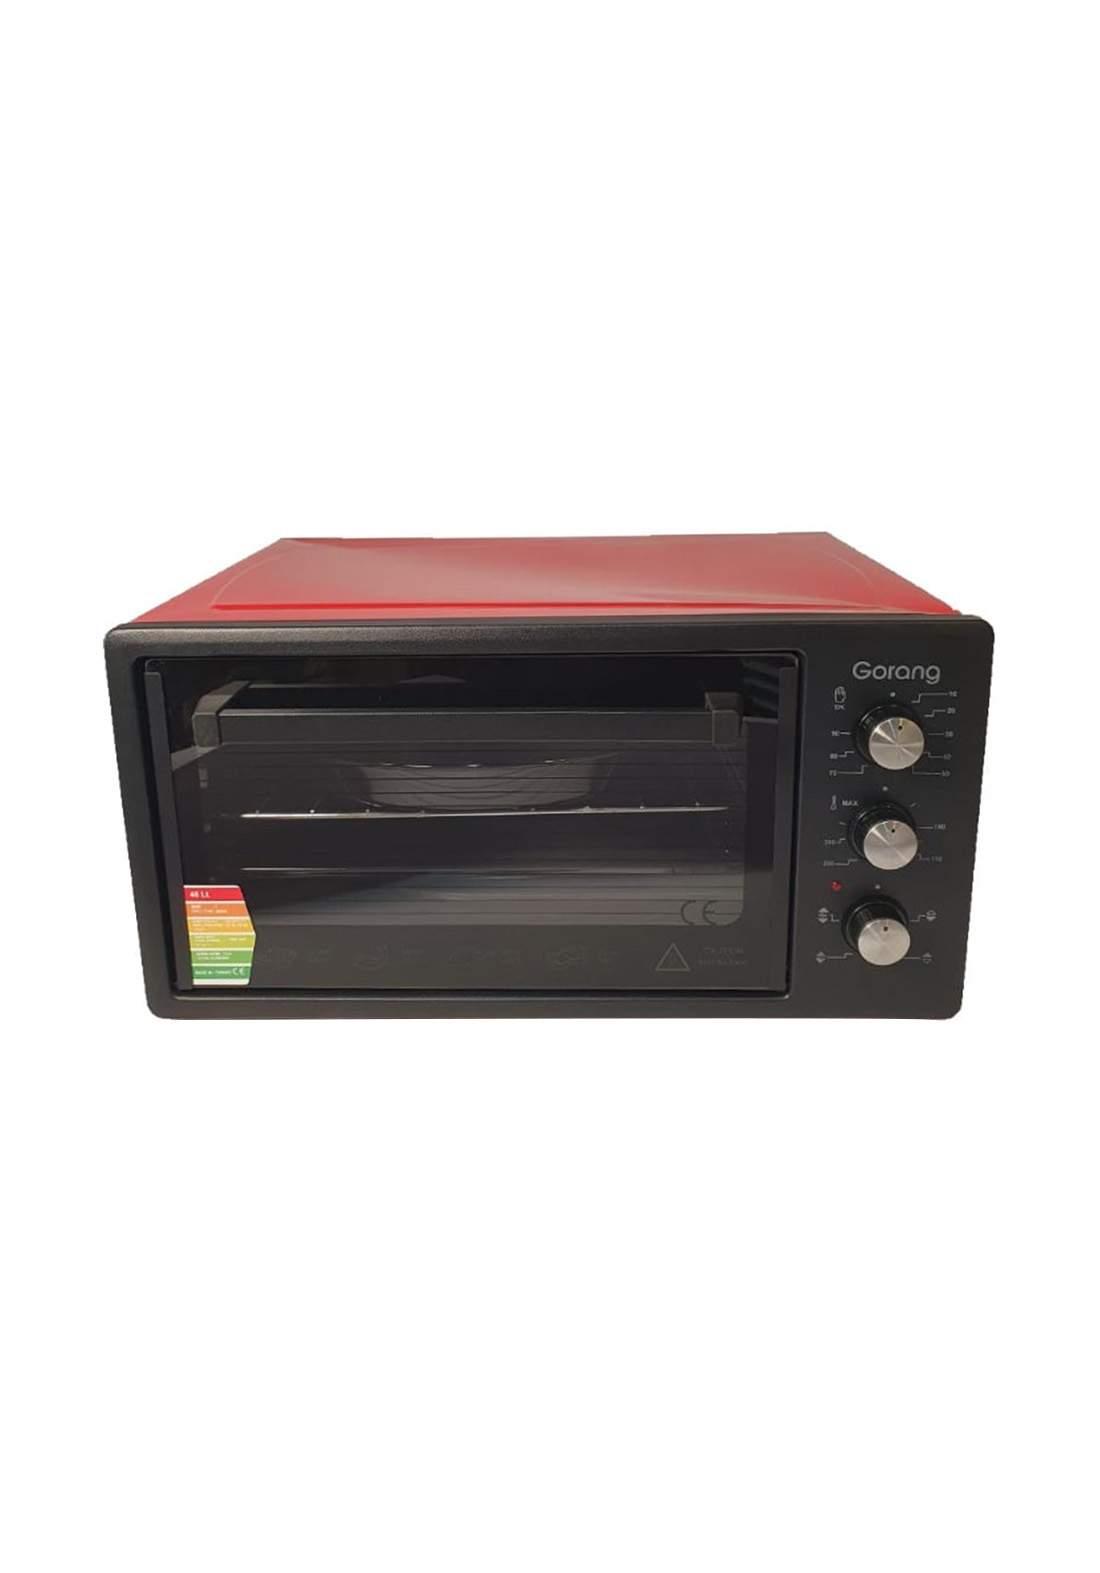 Gorang GOR-4100 Electric Oven  فرن كهربائي